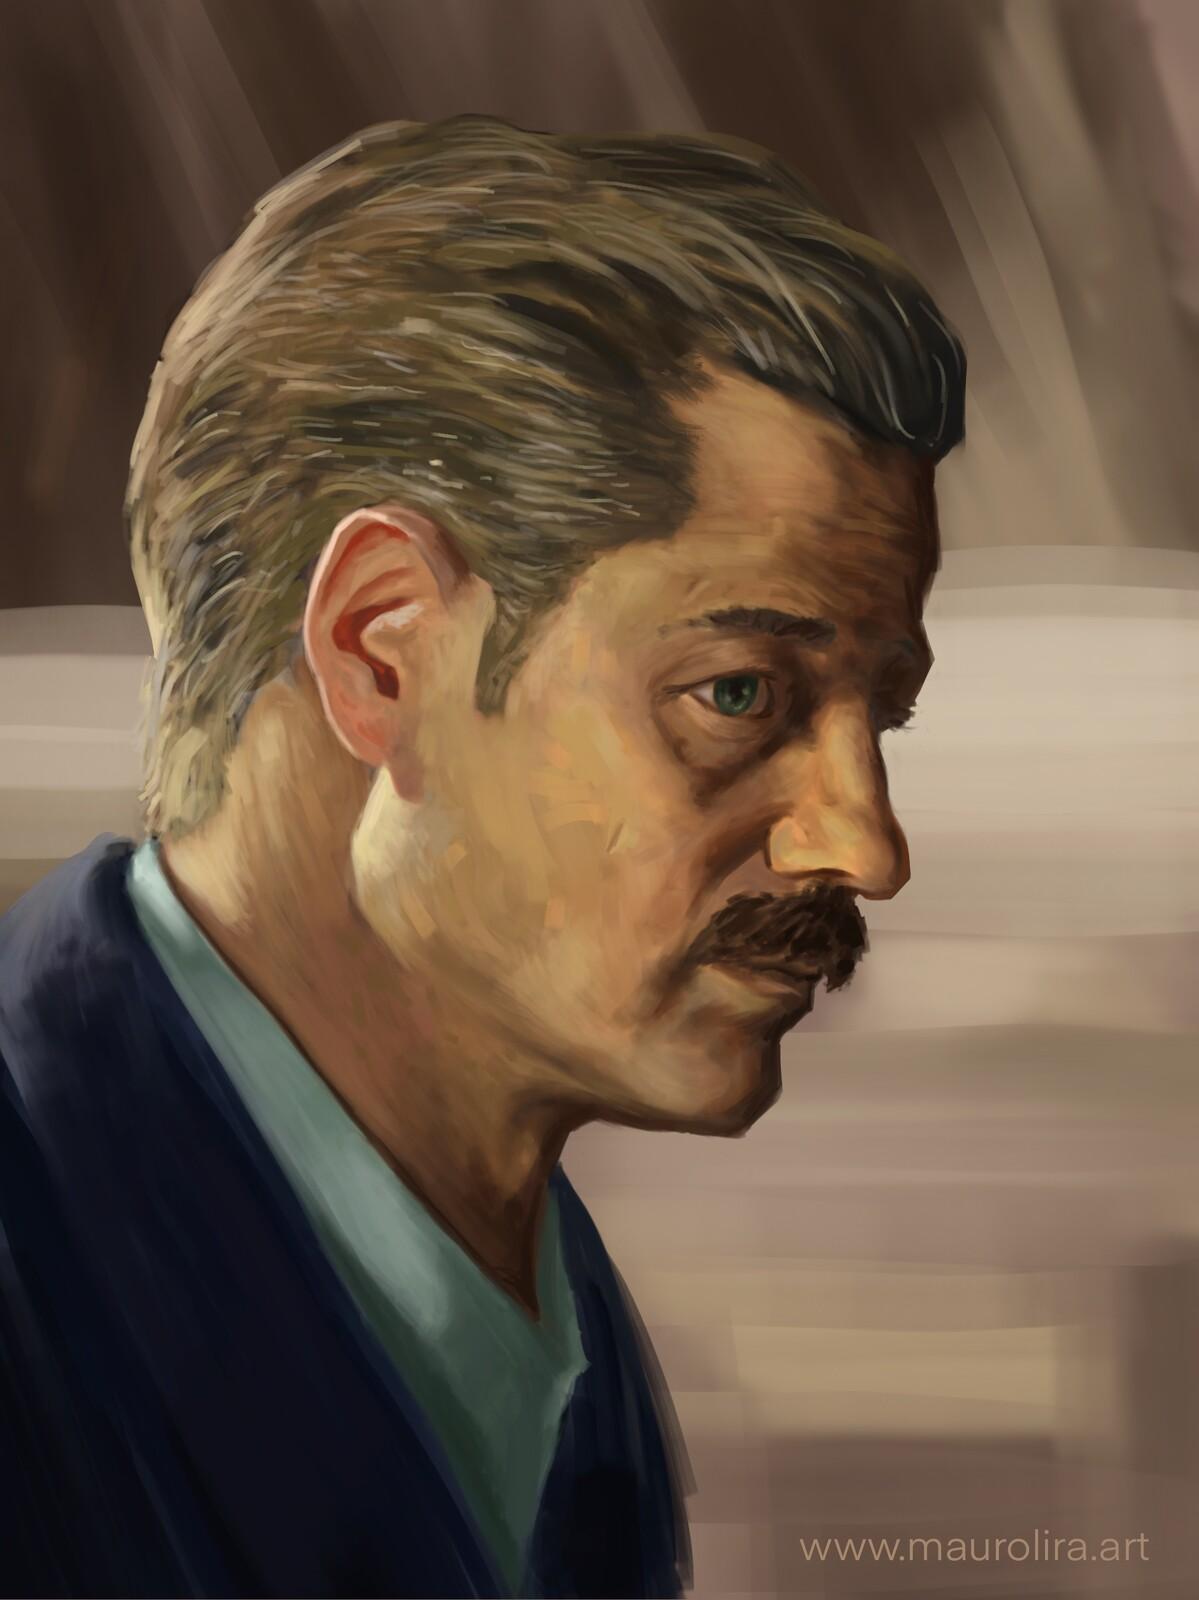 James Gordon Painting